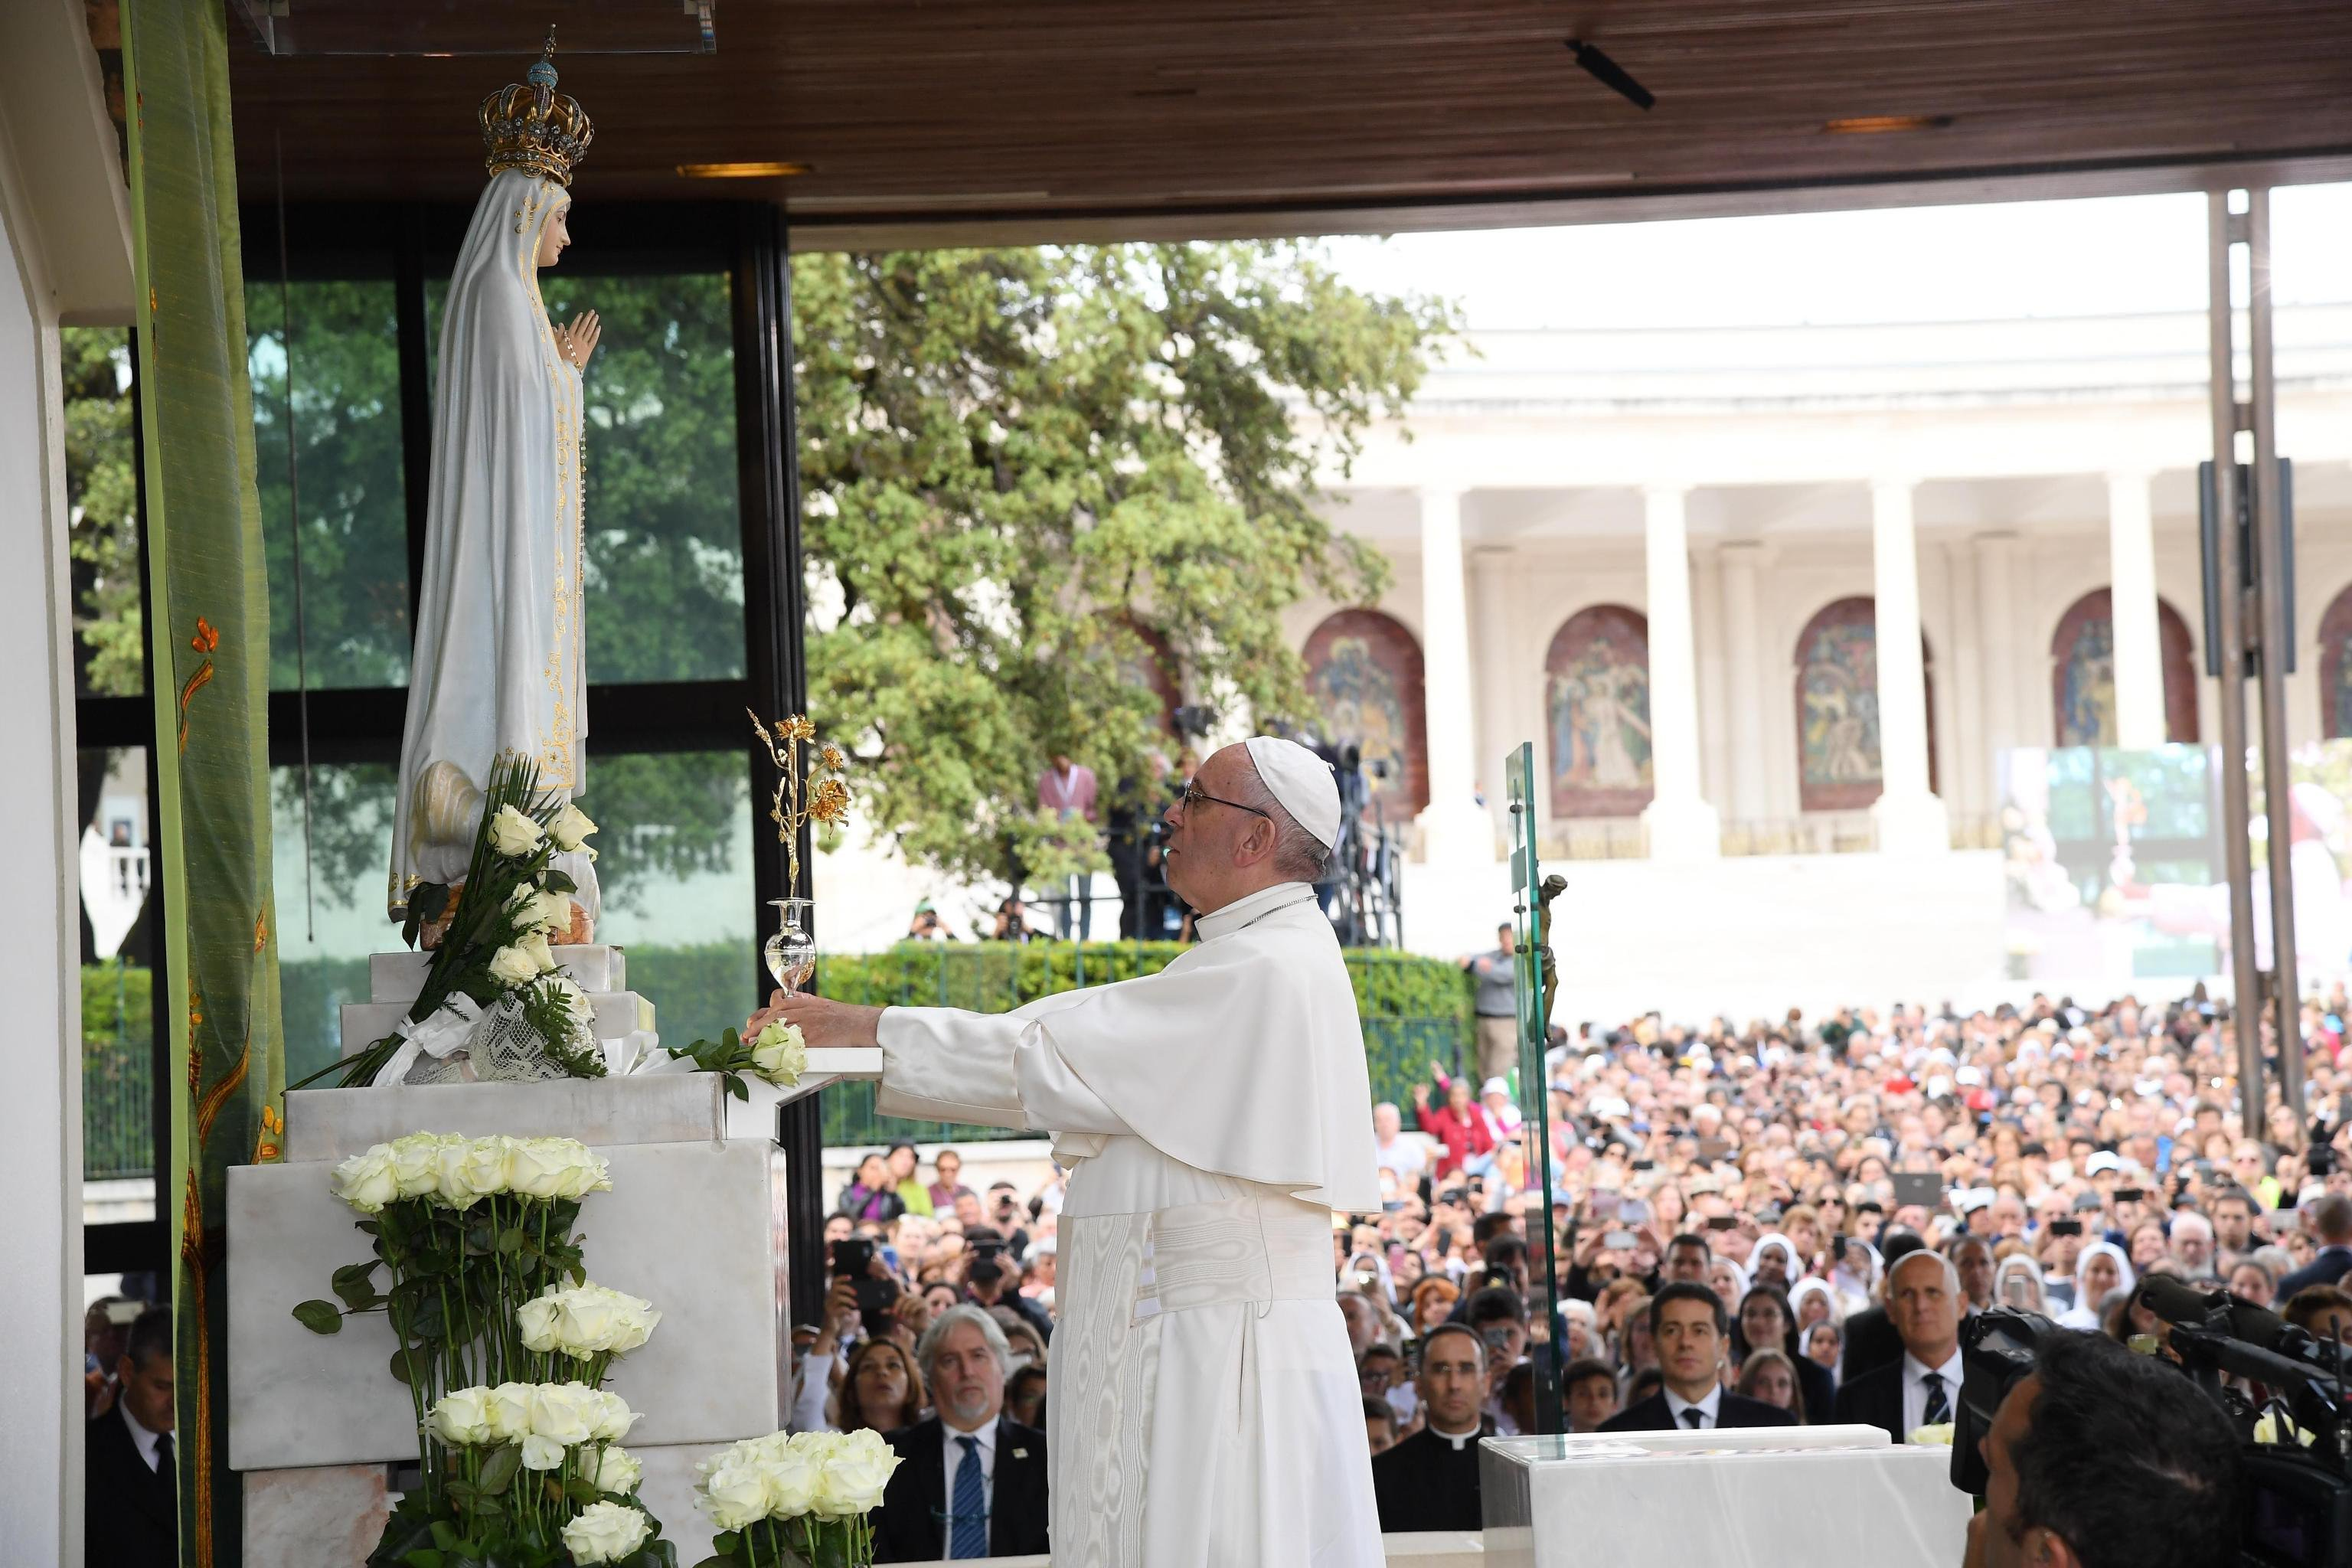 Papa canoniza a pastorcitos de Fátima